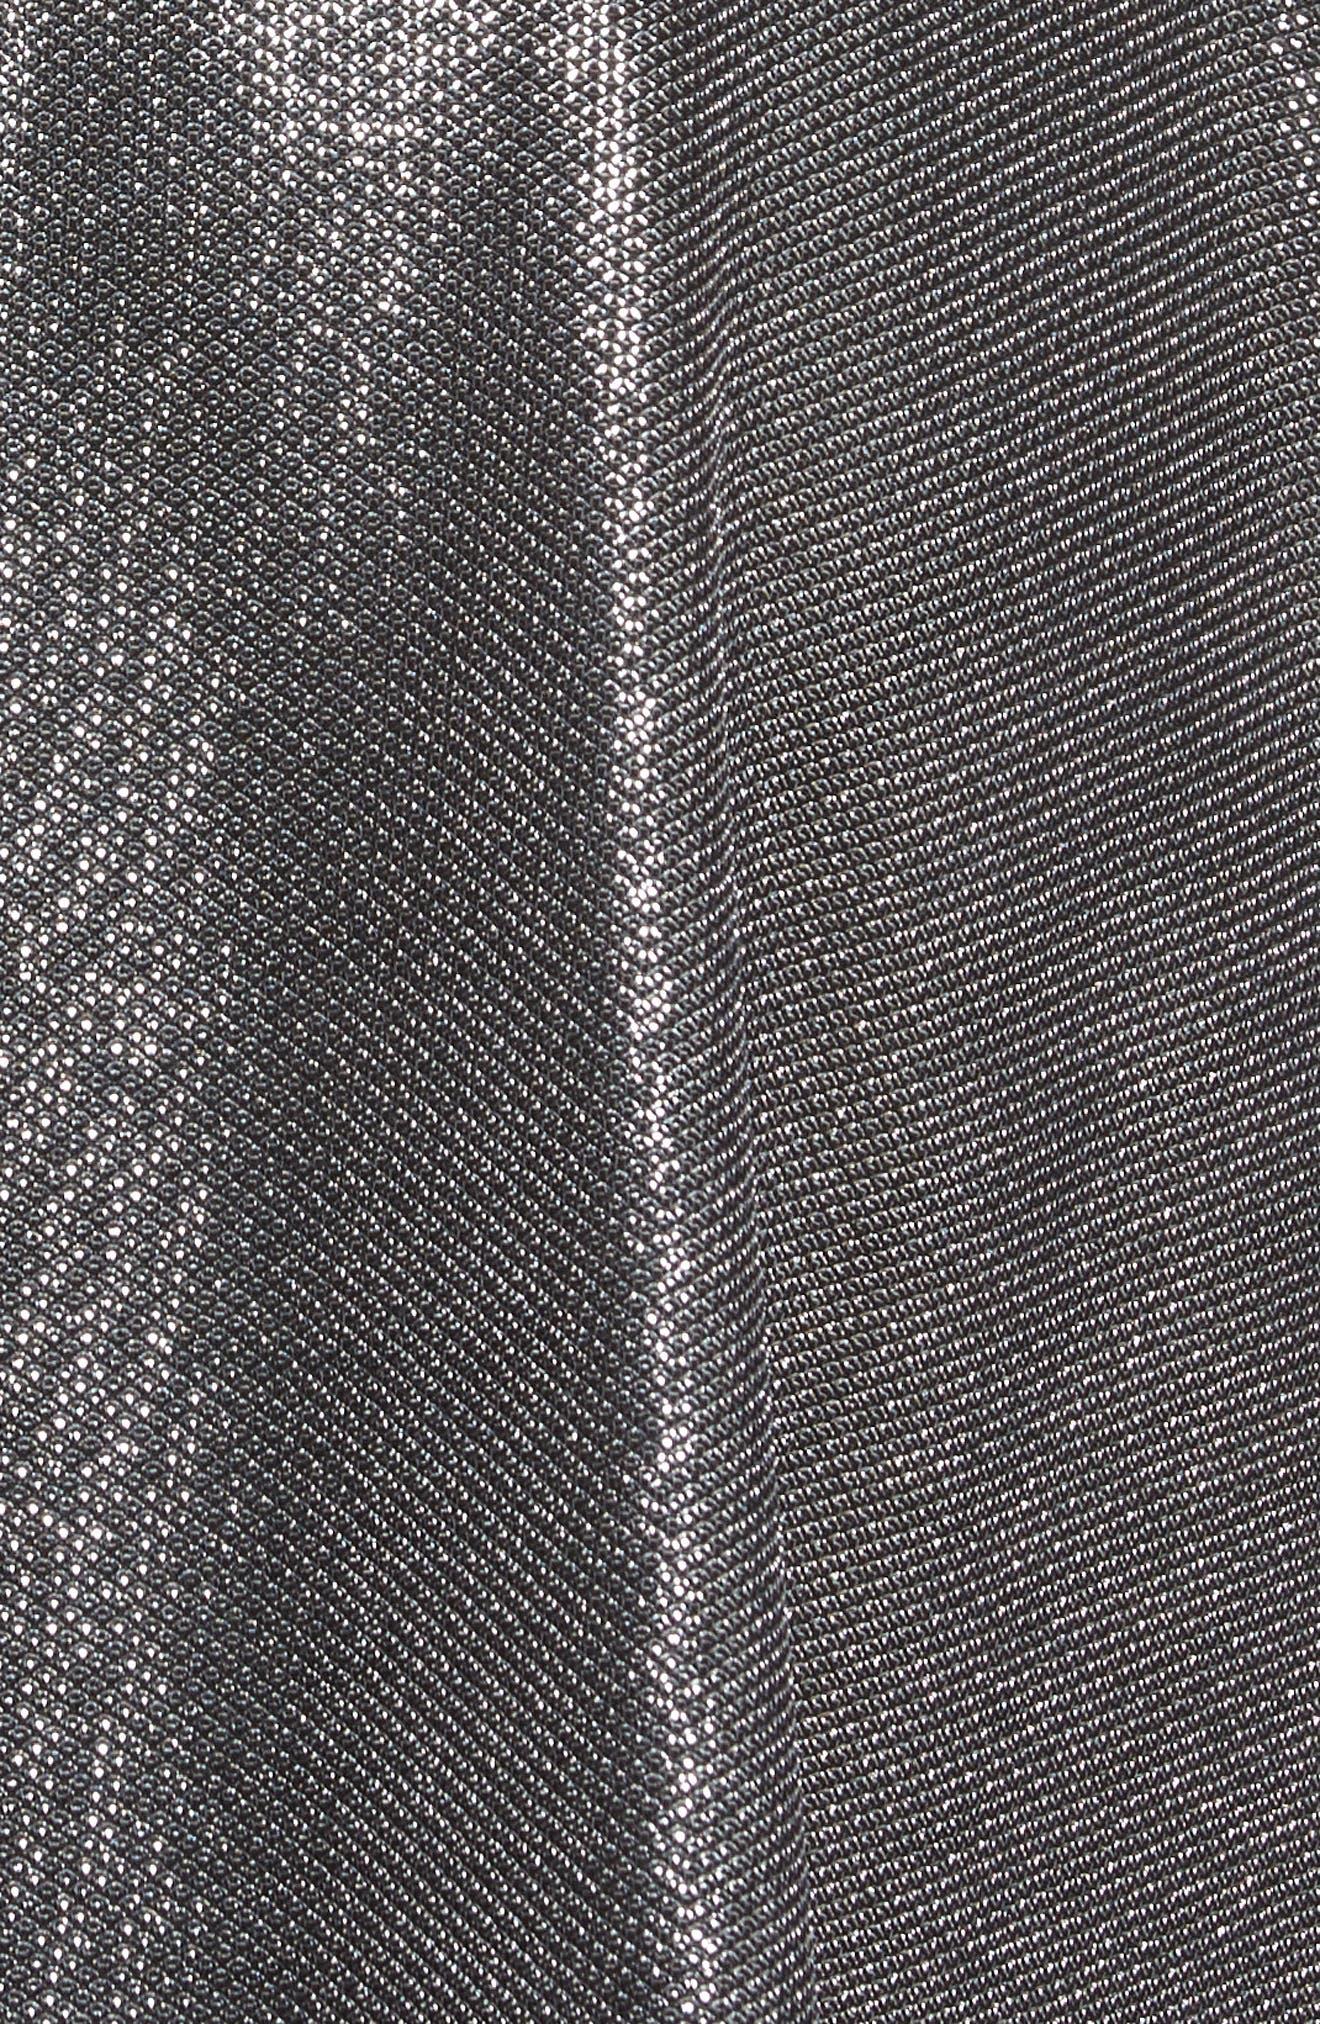 Draped High/Low Dress,                             Alternate thumbnail 5, color,                             045